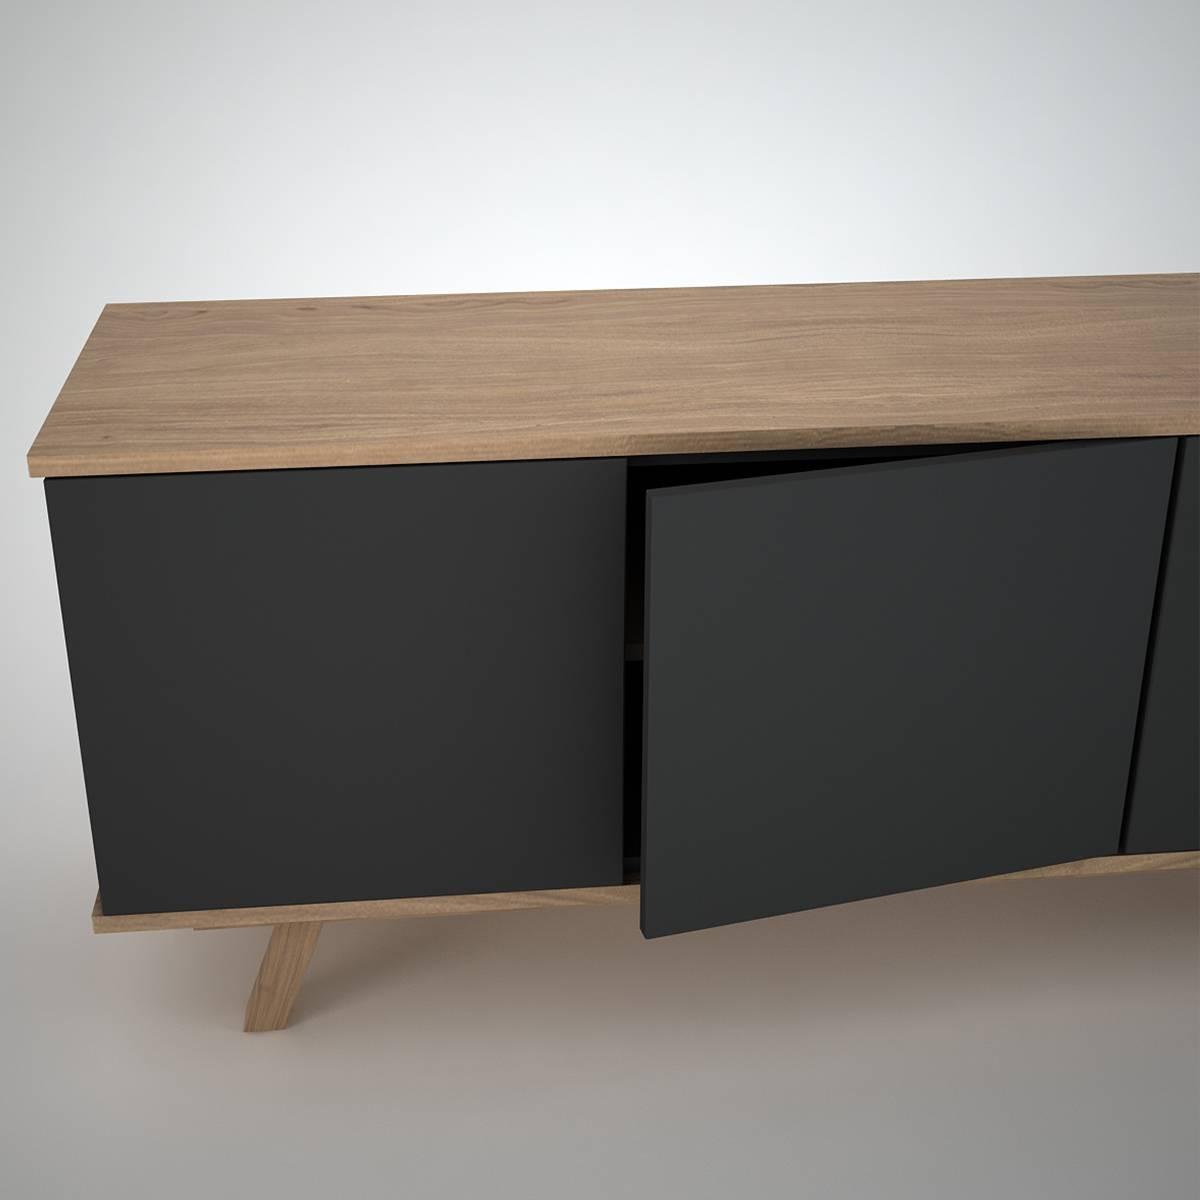 Furniture: Enchanting Black Modern Sideboard For Modern Interior Inside Modern Sideboard Furniture (#8 of 15)